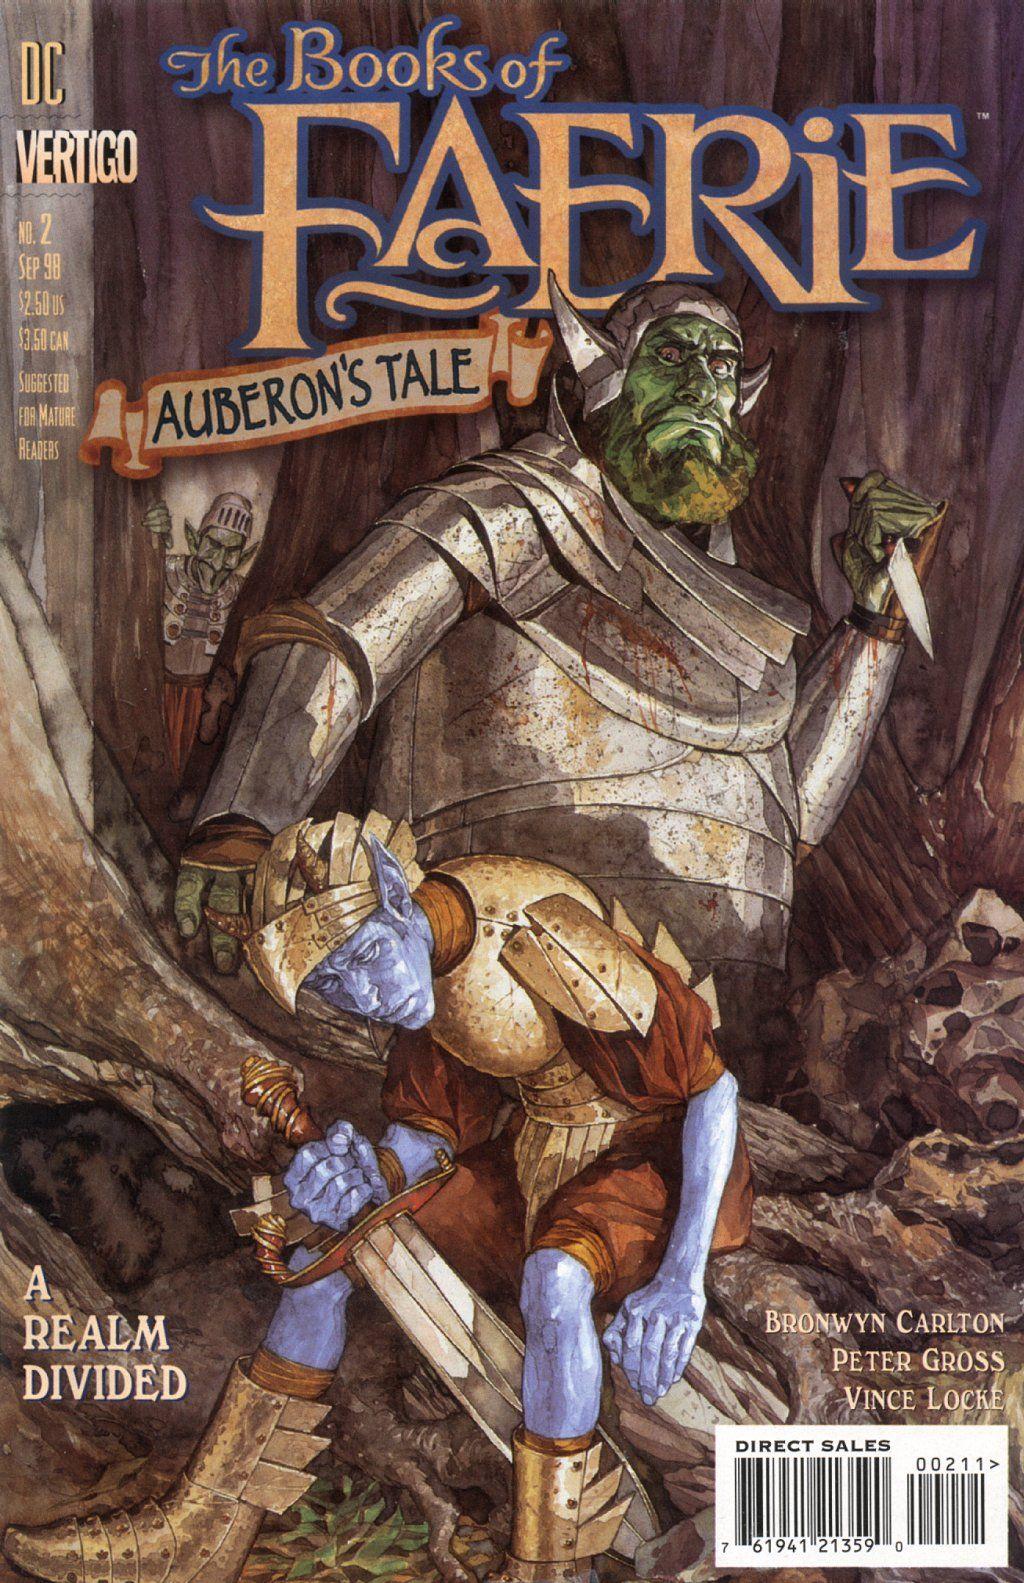 The Books of Faerie: Auberon's Tale, No. 2 - http://www.amazon.com/gp/product/B002U4QOYA/ref=as_li_ss_tl?ie=UTF8=1789=390957=B002U4QOYA=as2=azraelssuperd-20